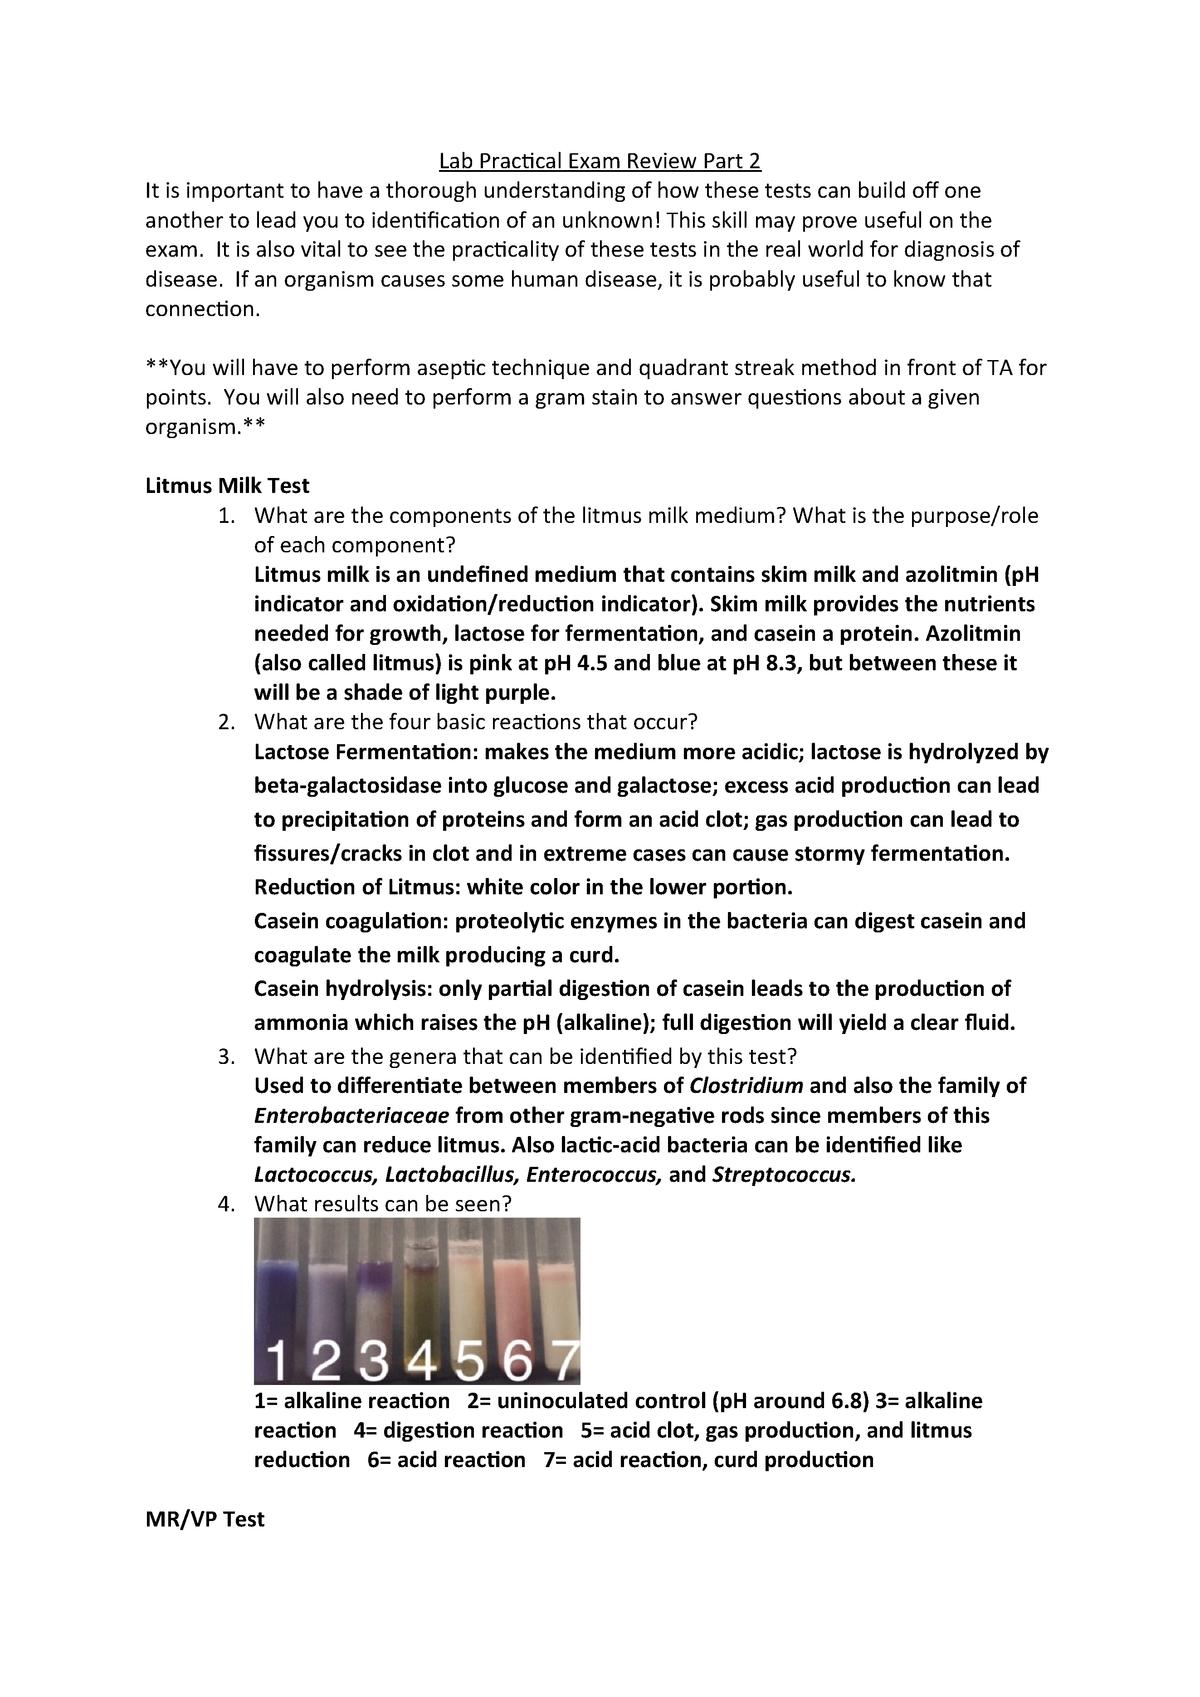 Biol251L Lab Practical Exam Review Part 2 - BIOL 251L - UNLV